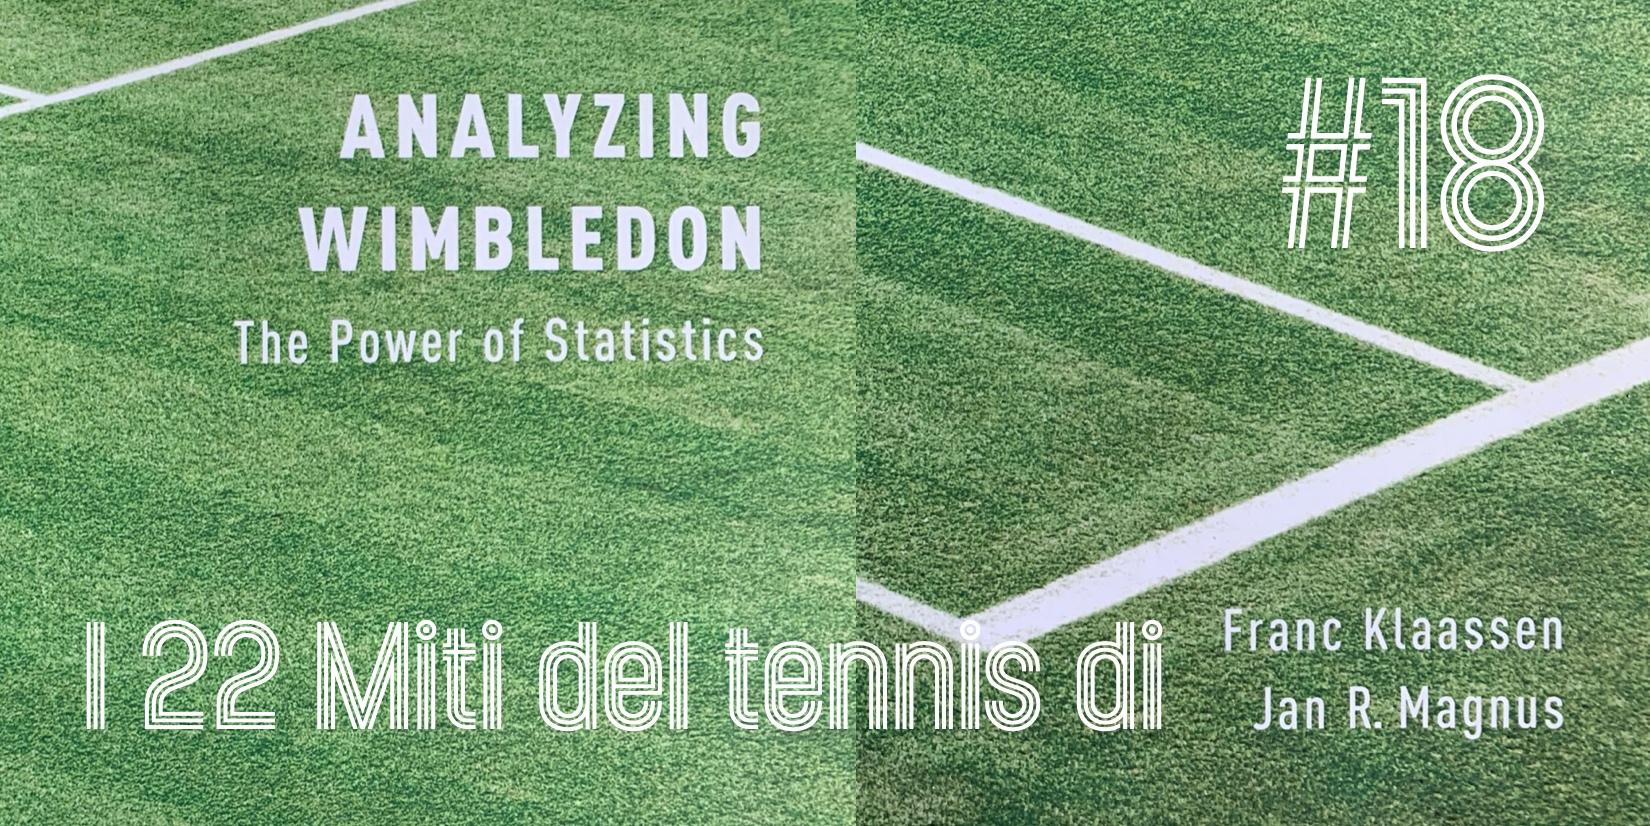 I 22 miti del tennis di Klaassen & Magnus – Mito 18 - settesei.it